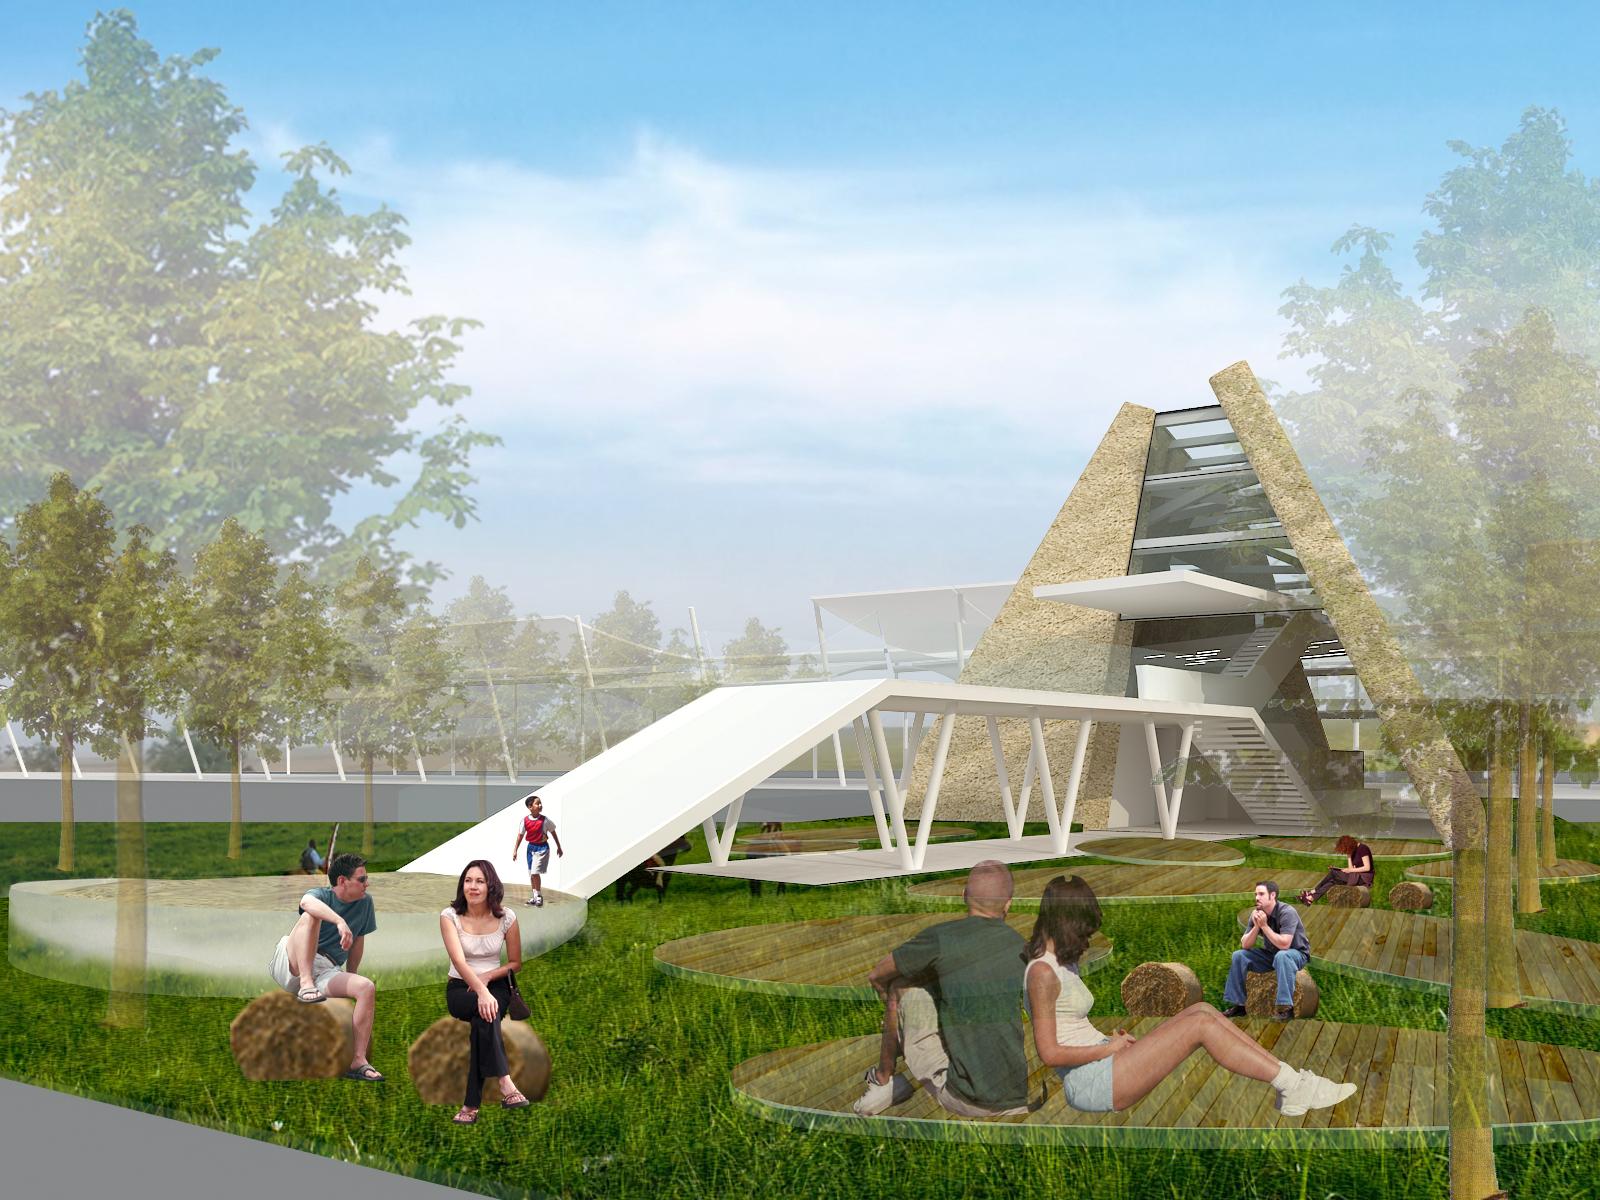 https://nbc-arhitect.ro/wp-content/uploads/2020/10/NBC-Arhitect-_-contests-_-Romanian-Pavillion-_-Milan-Expo-Contest-2015_3.jpg